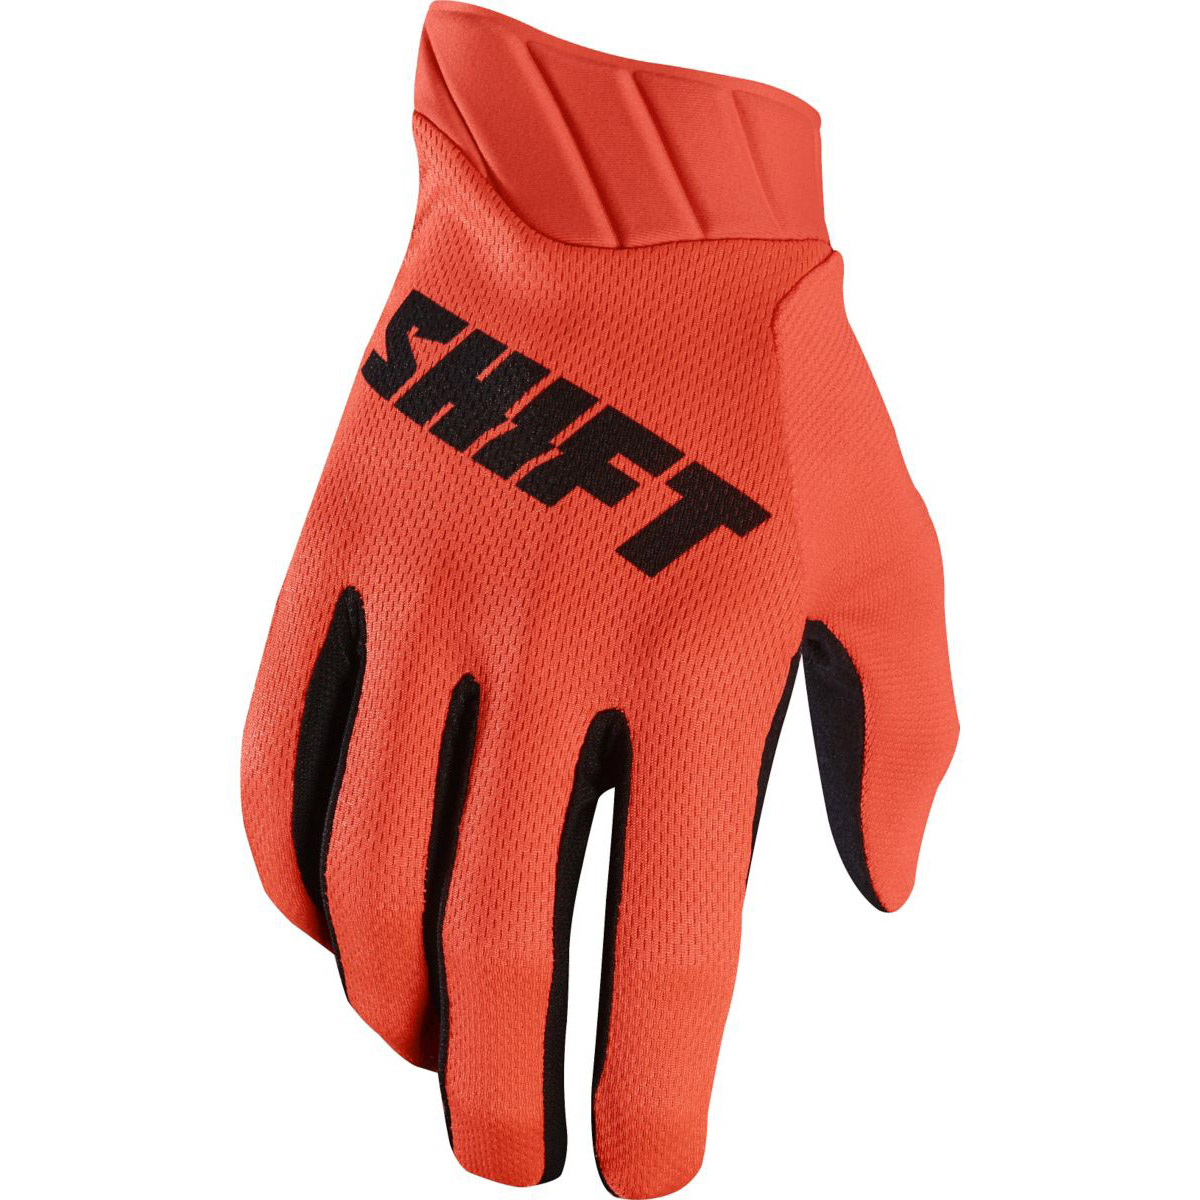 Shift - 2017 3LACK Label Air перчатки, оранжевые